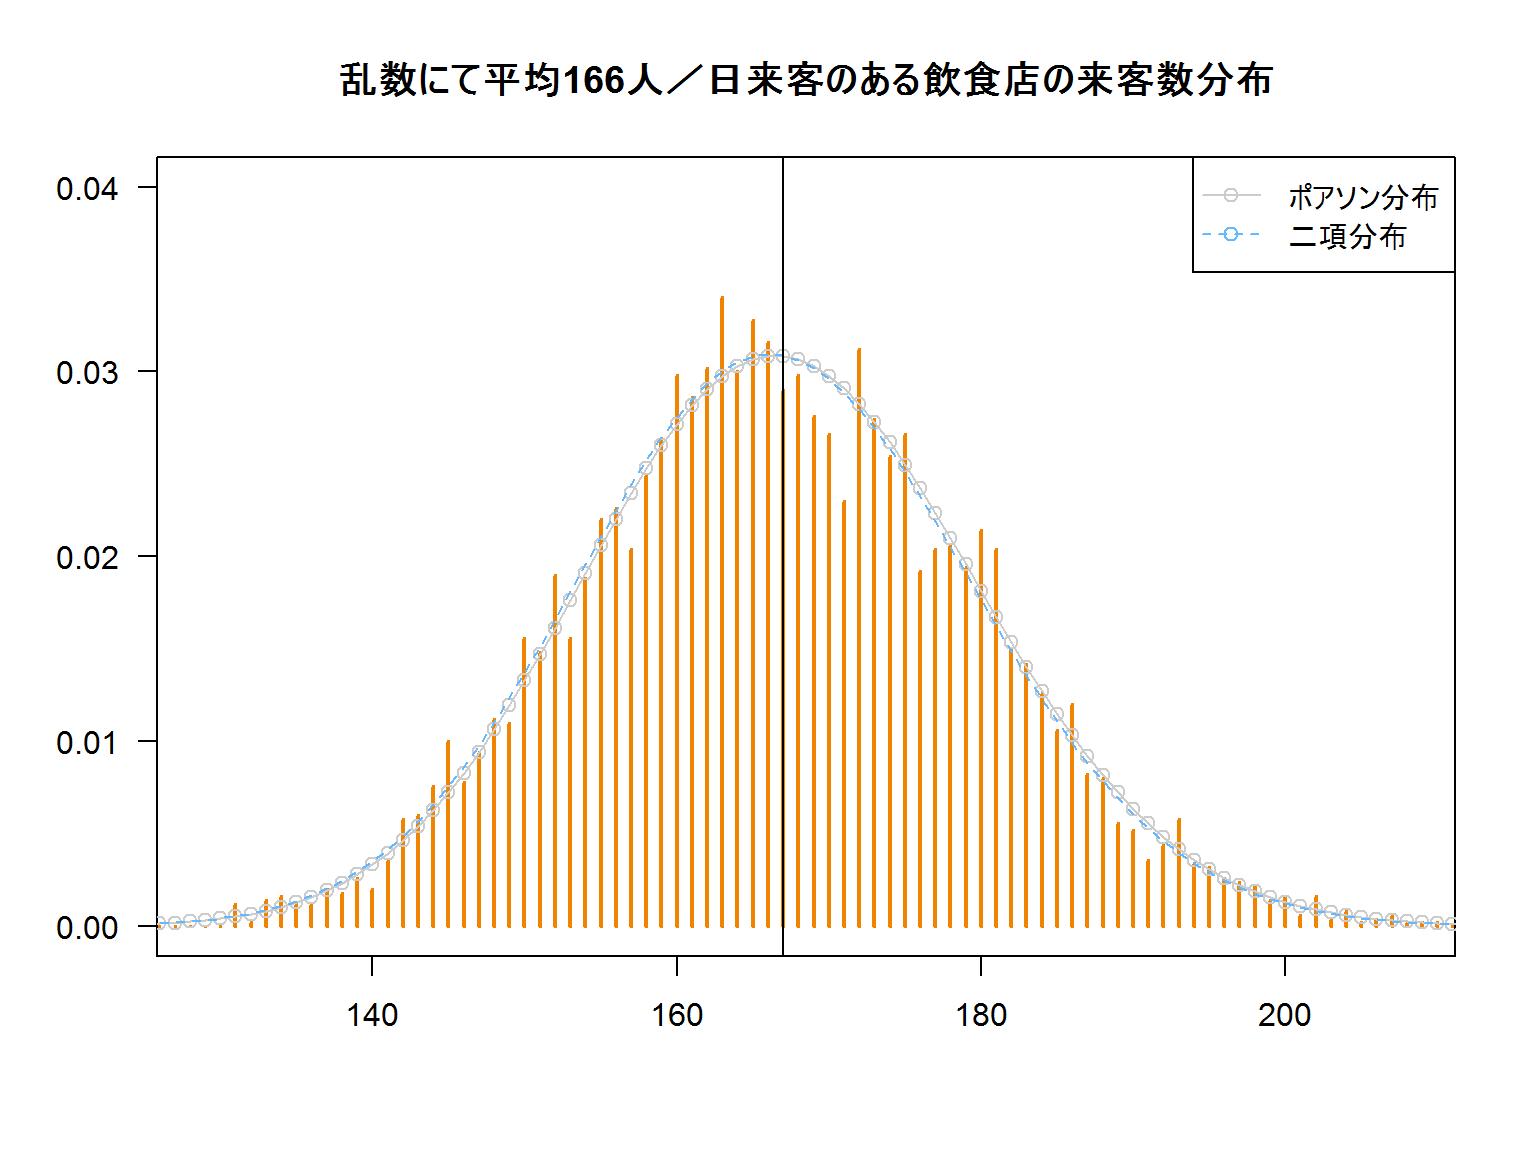 Poisson_distribution_3